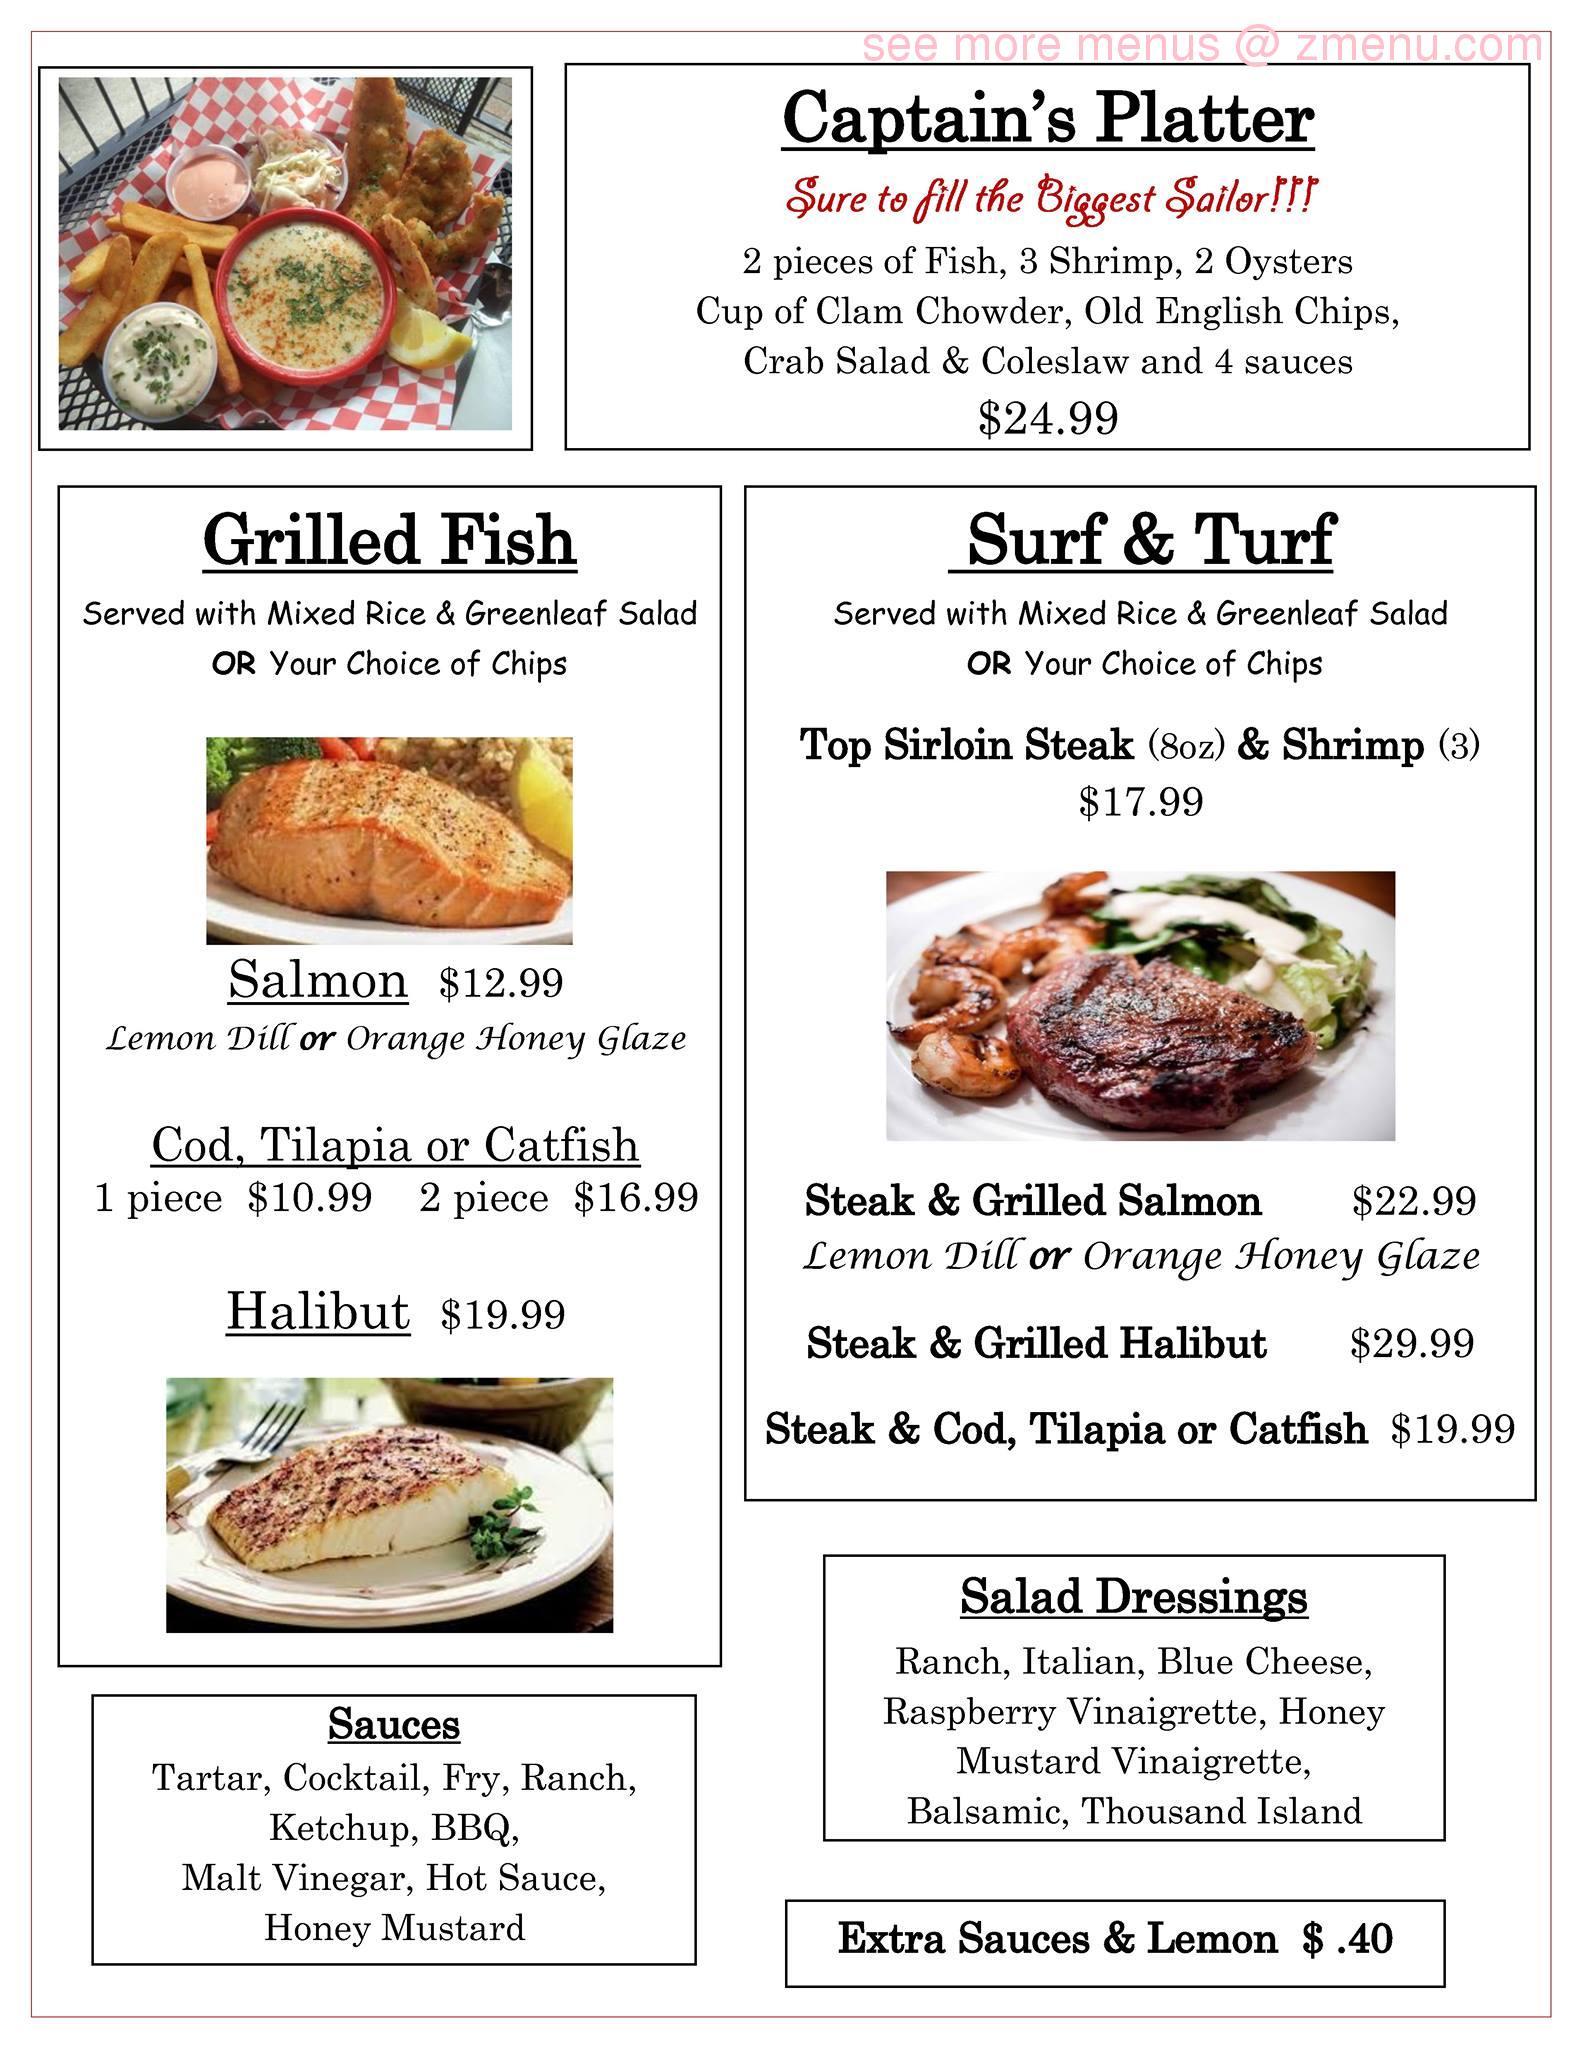 Online menu of sea bears fish house grill restaurant for Fish house menu